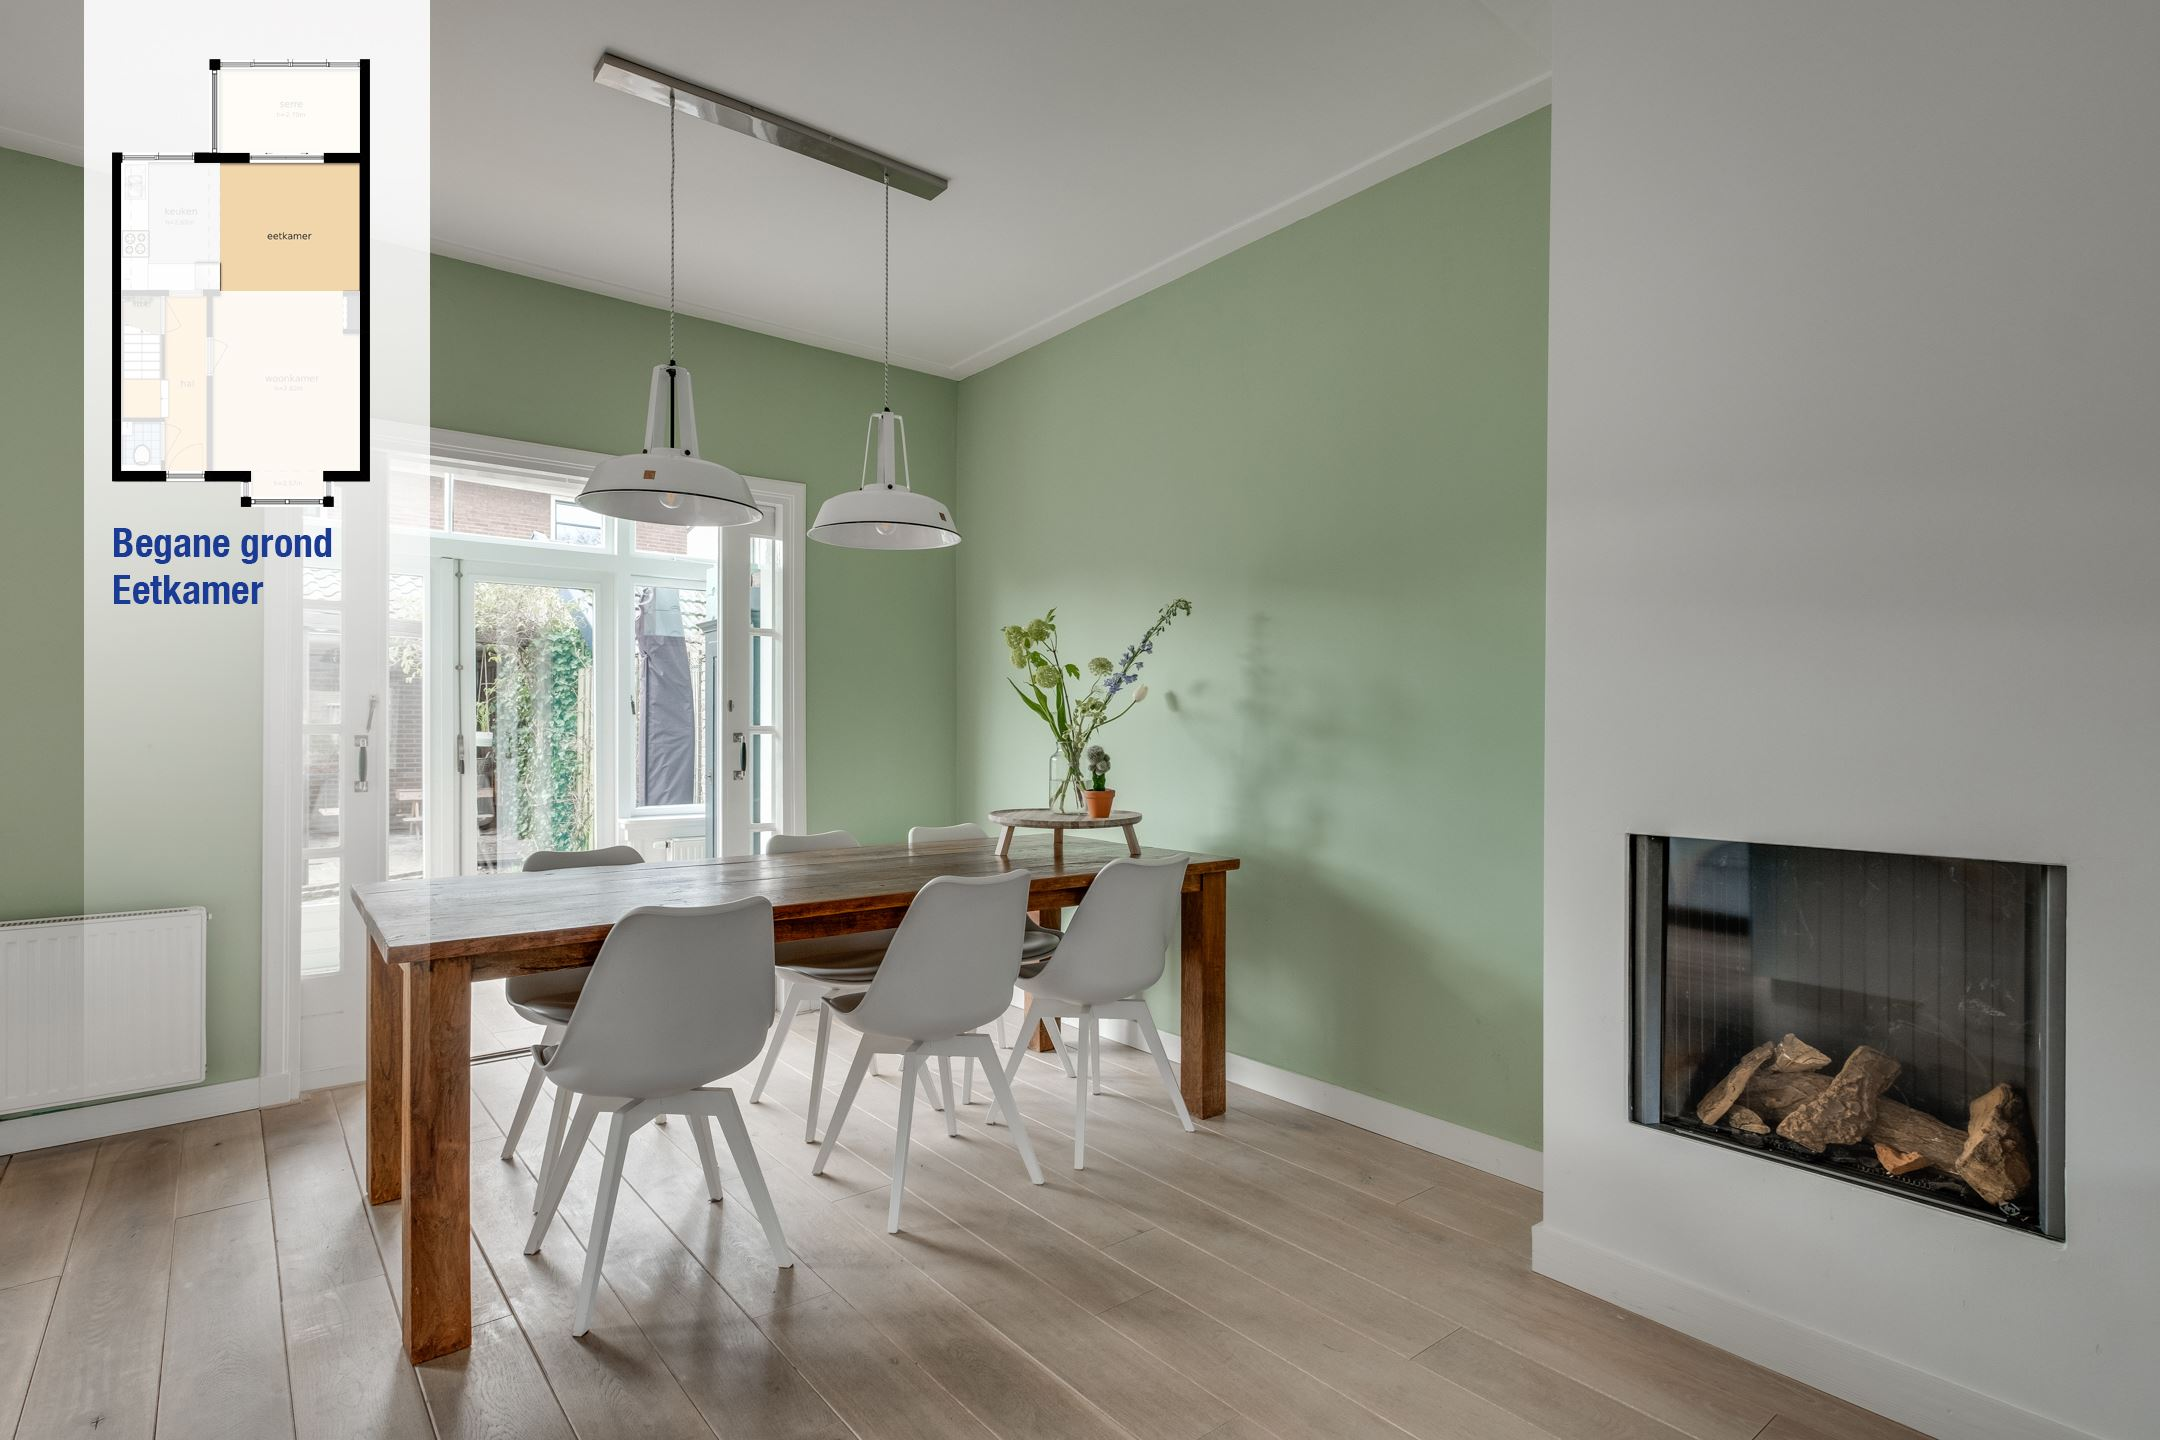 Eetkamer Van Oranje : Welkom in de eetkamer en woonkamer van villa m mastermeubel